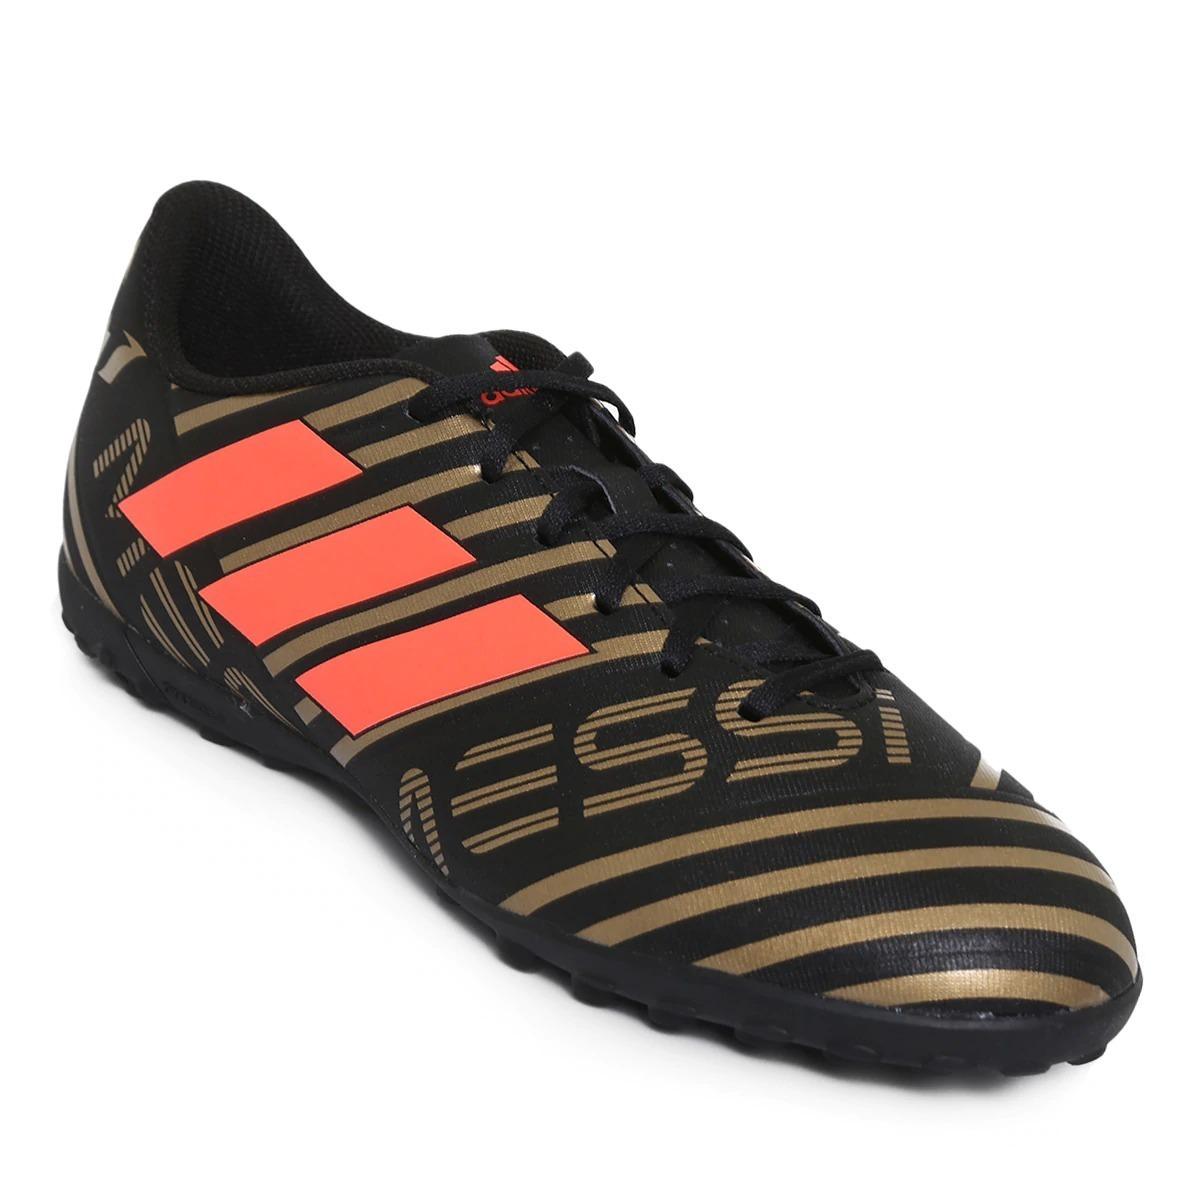 online store 6faba 147a7 tenis adidas nemeziz messi tango 17.4 t cp9070 originales. Cargando zoom.